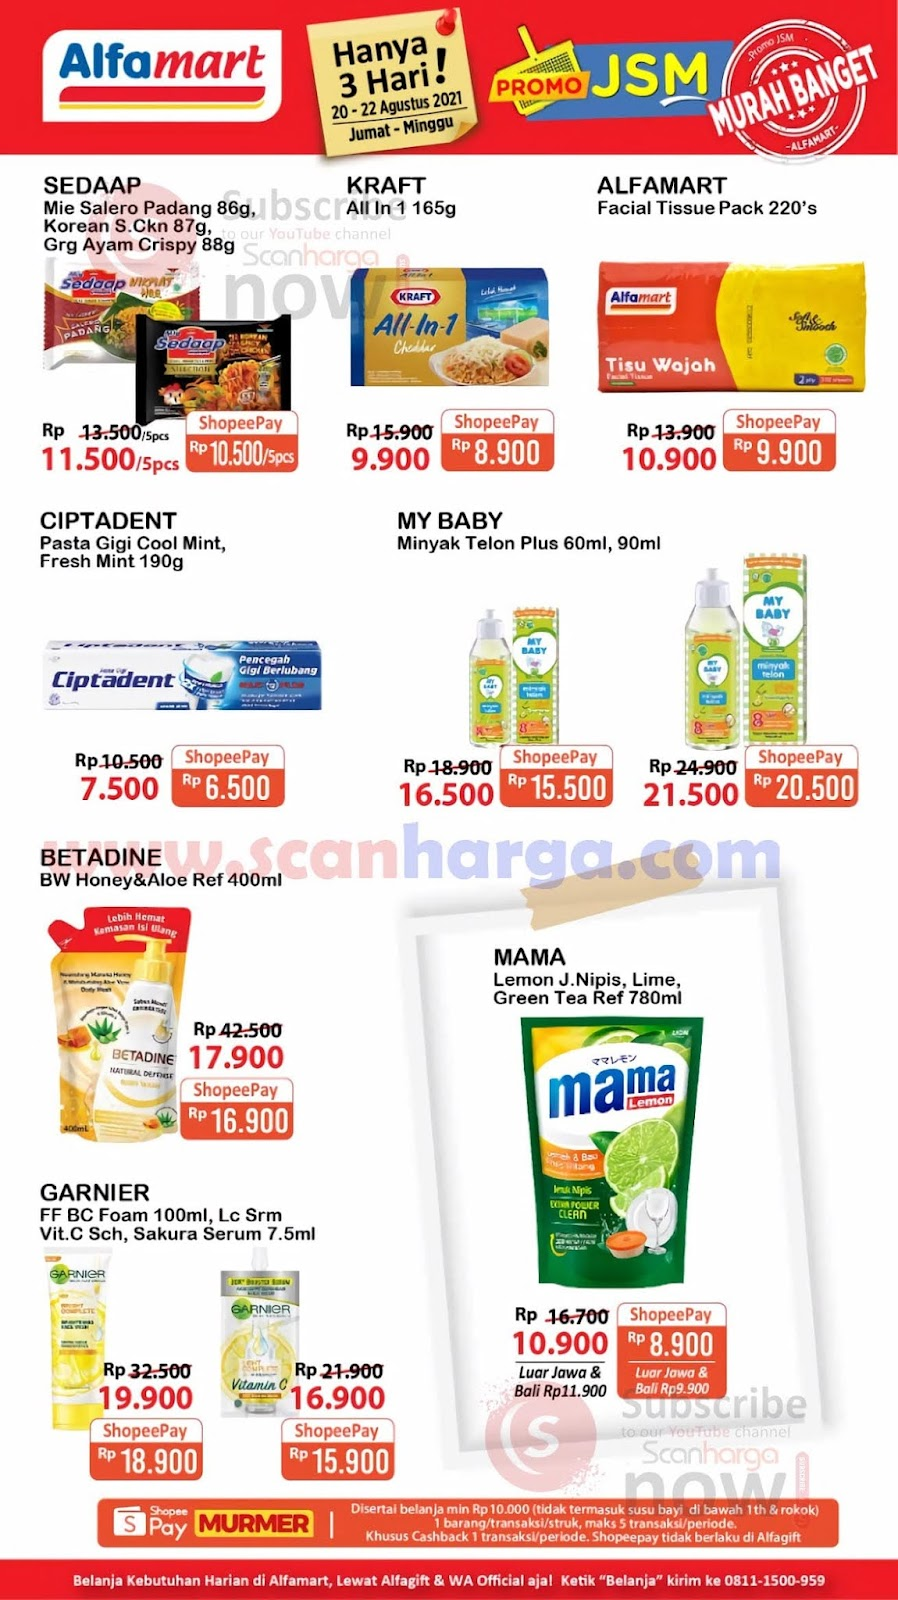 Katalog Promo JSM Alfamart Weekend 20 - 22 Agustus 2021 2